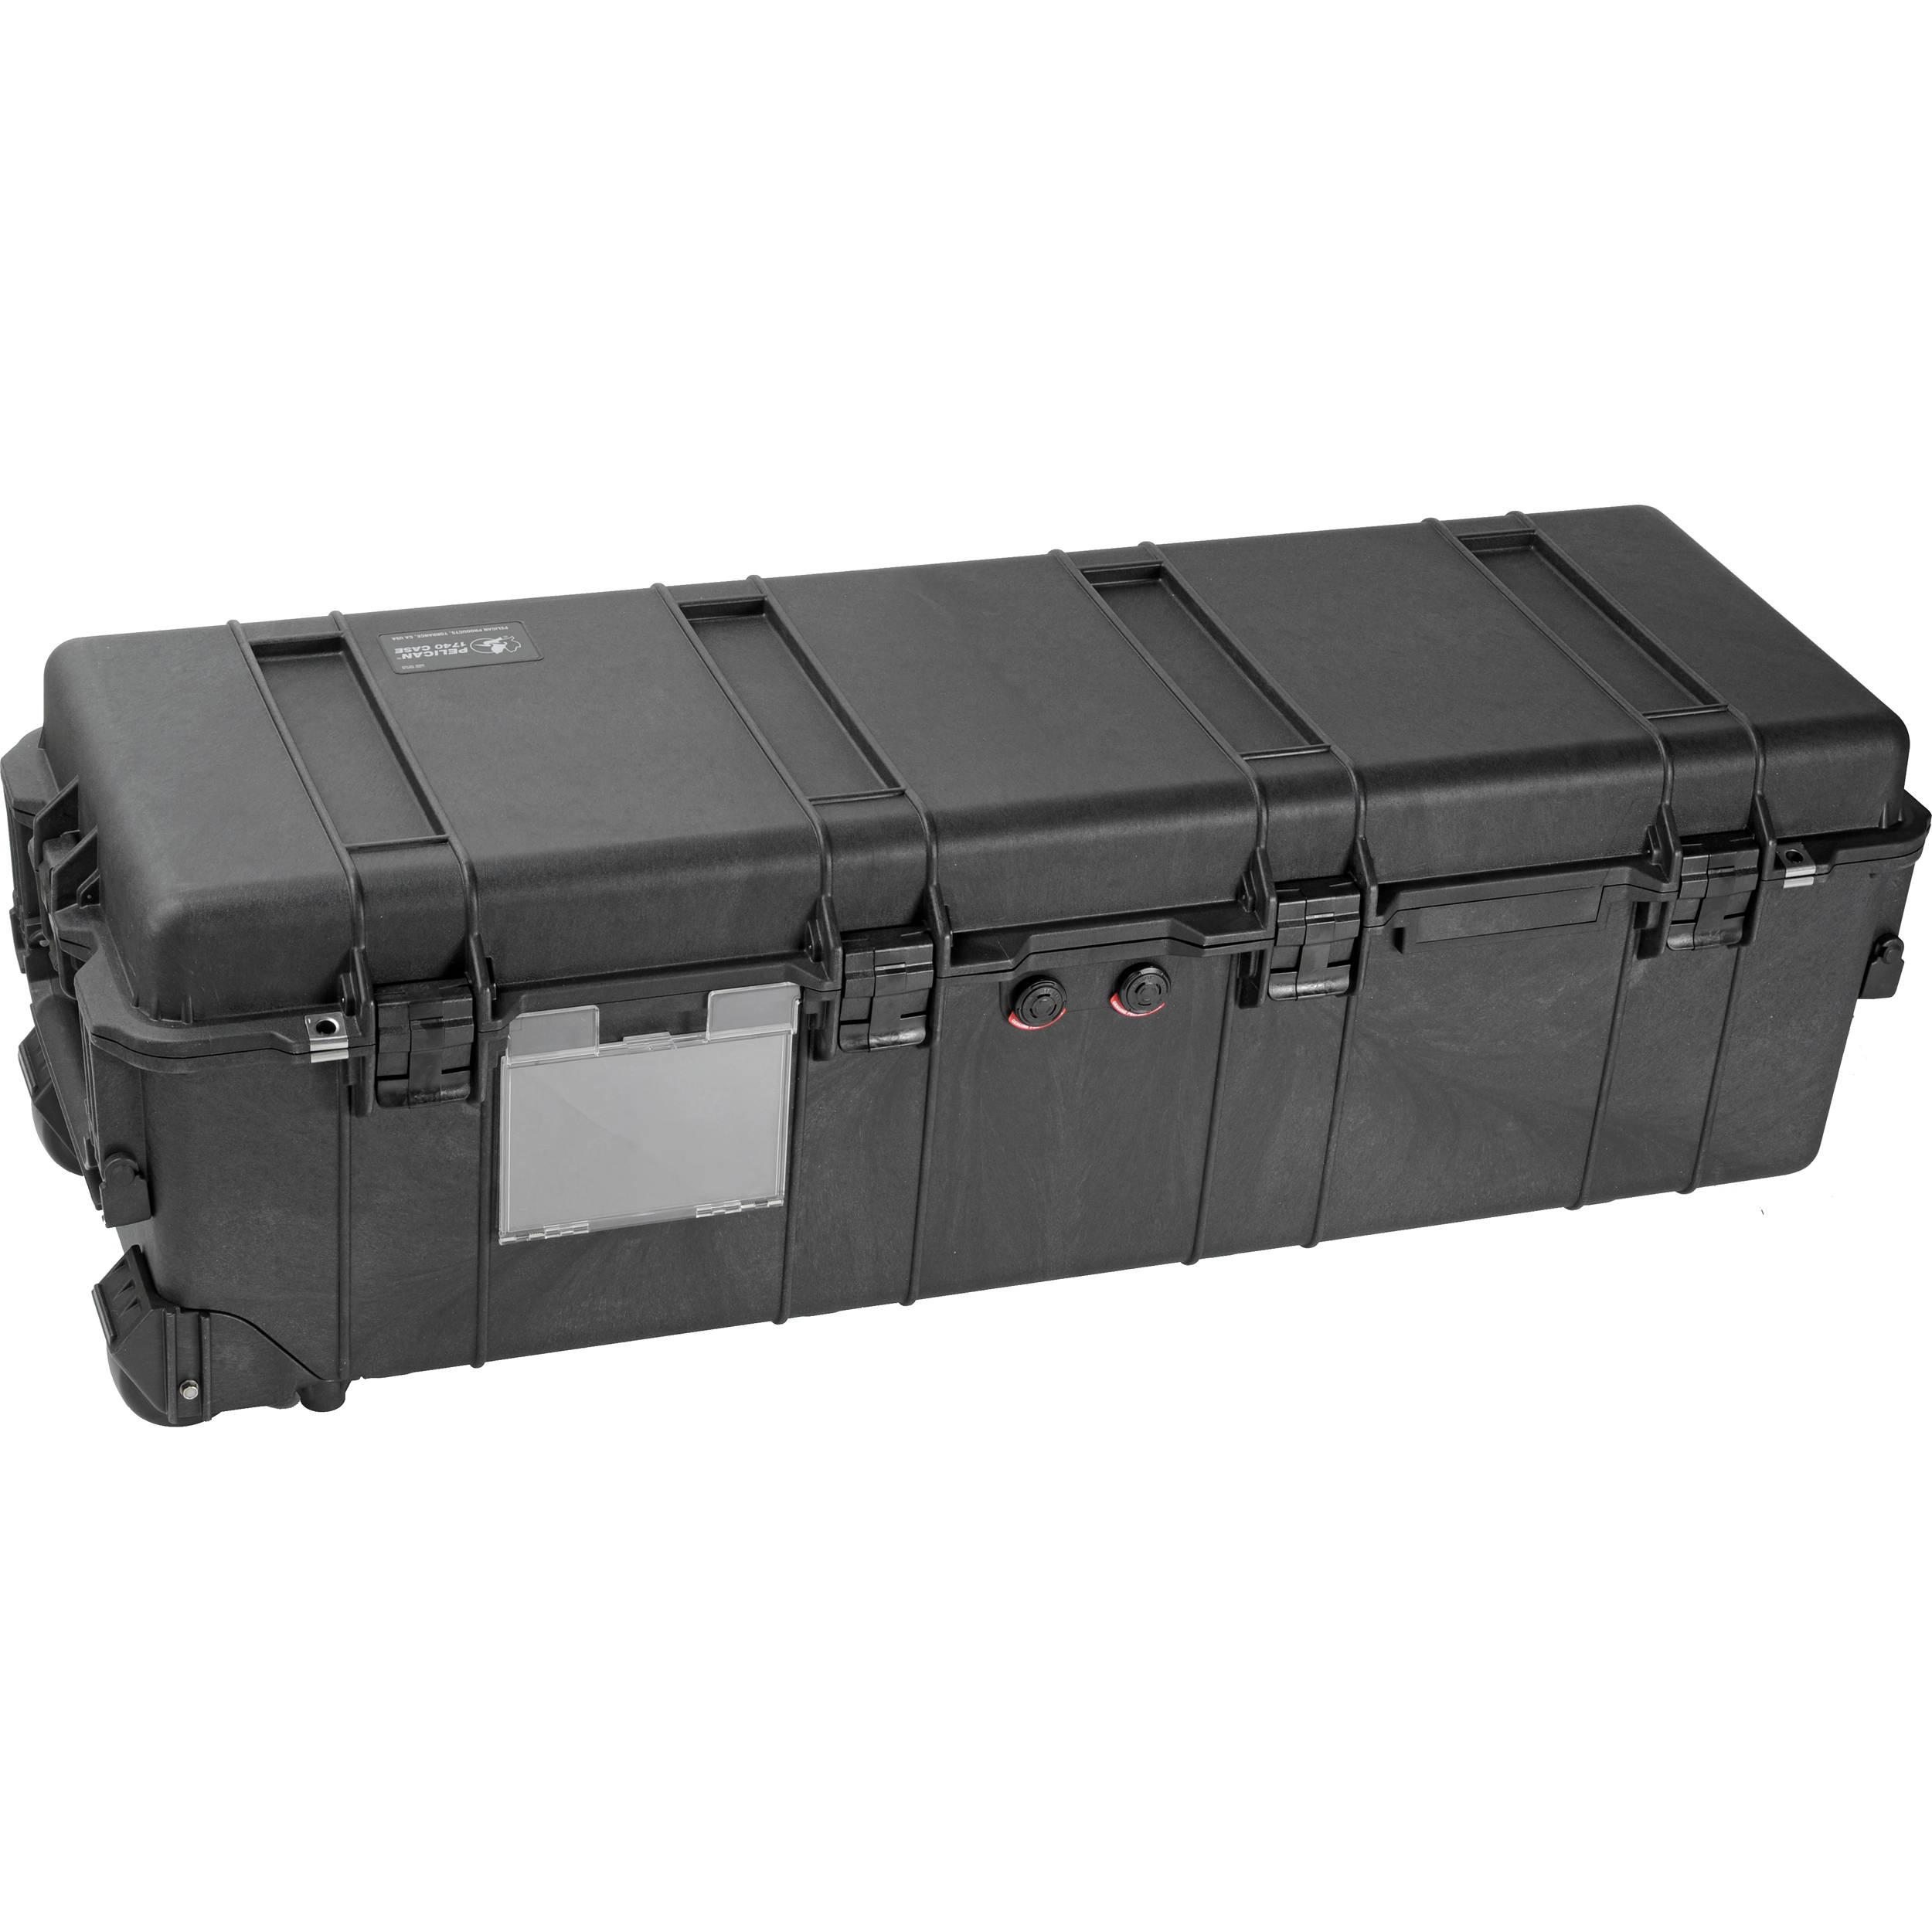 Pelican 1740NF Transport Case without Foam (Black)